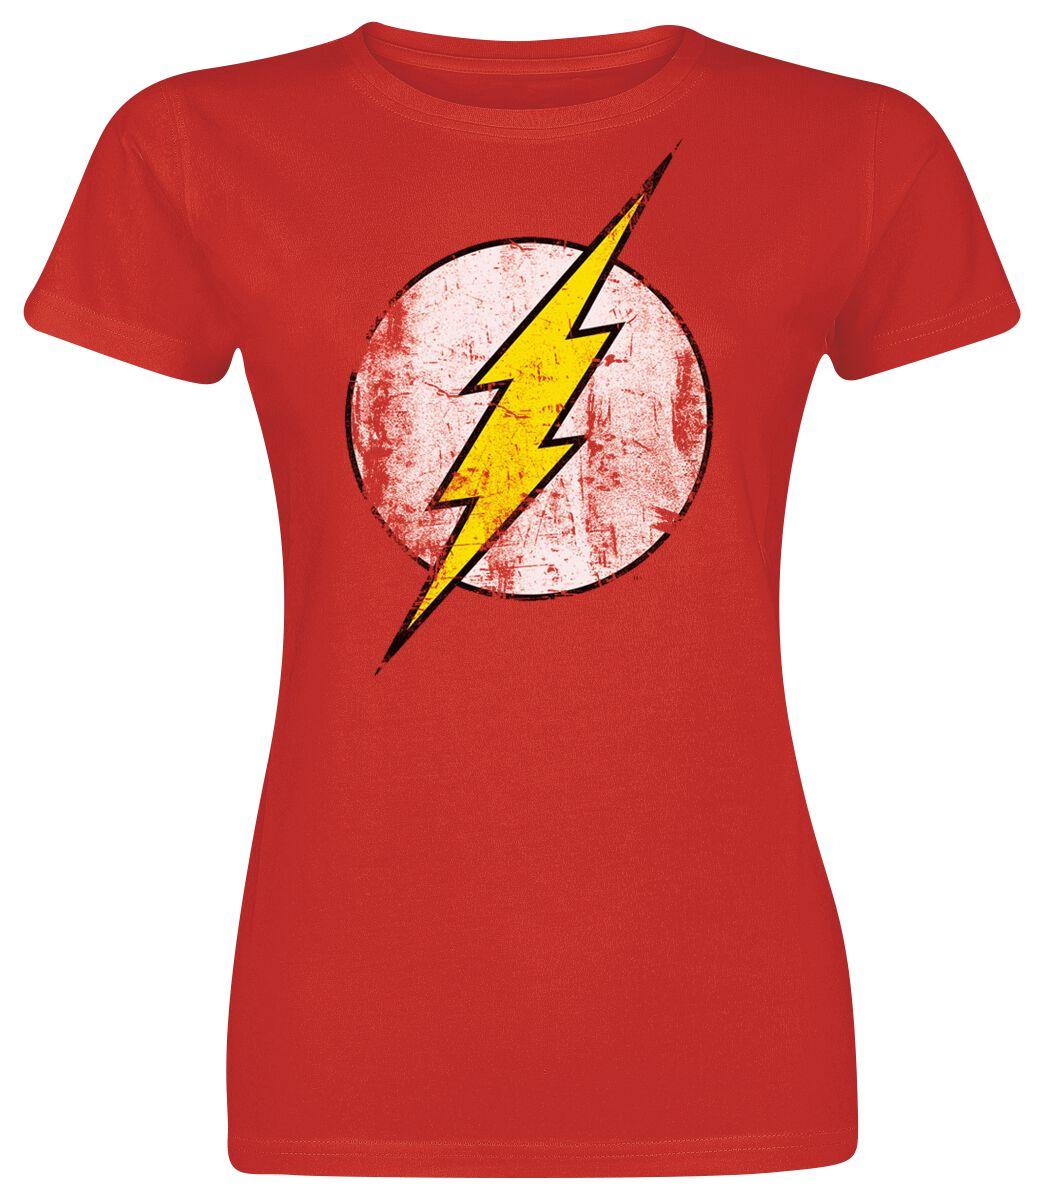 Merch dla Fanów - Koszulki - Koszulka damska The Flash Logo Koszulka damska czerwony - 330315